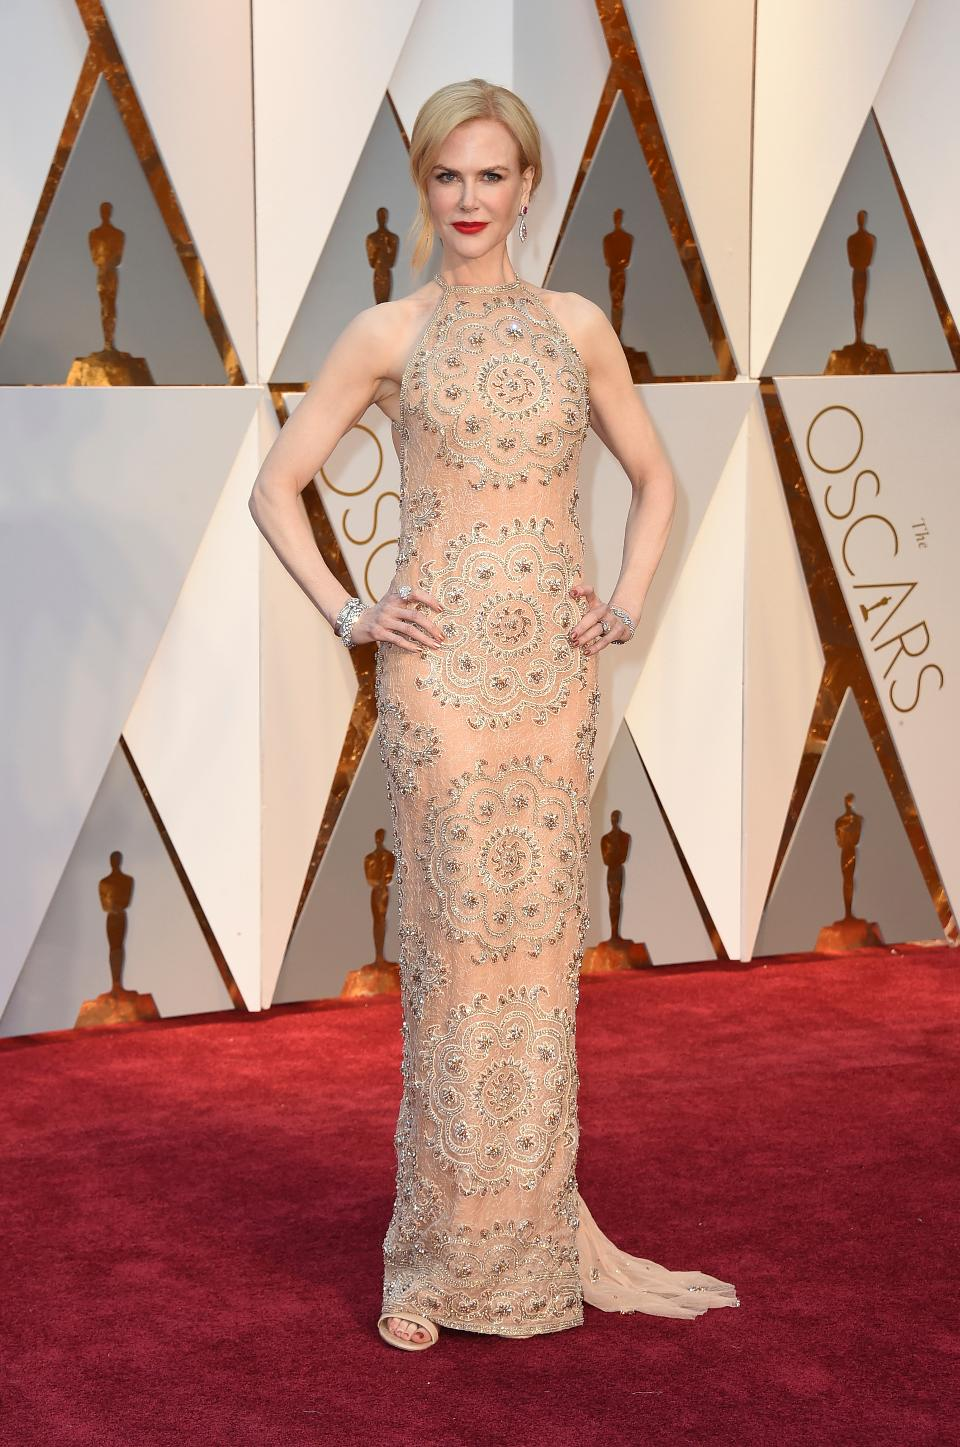 Nicole Kidman Steals the Oscars 2017 Best Watch with Secret Vintage Omega